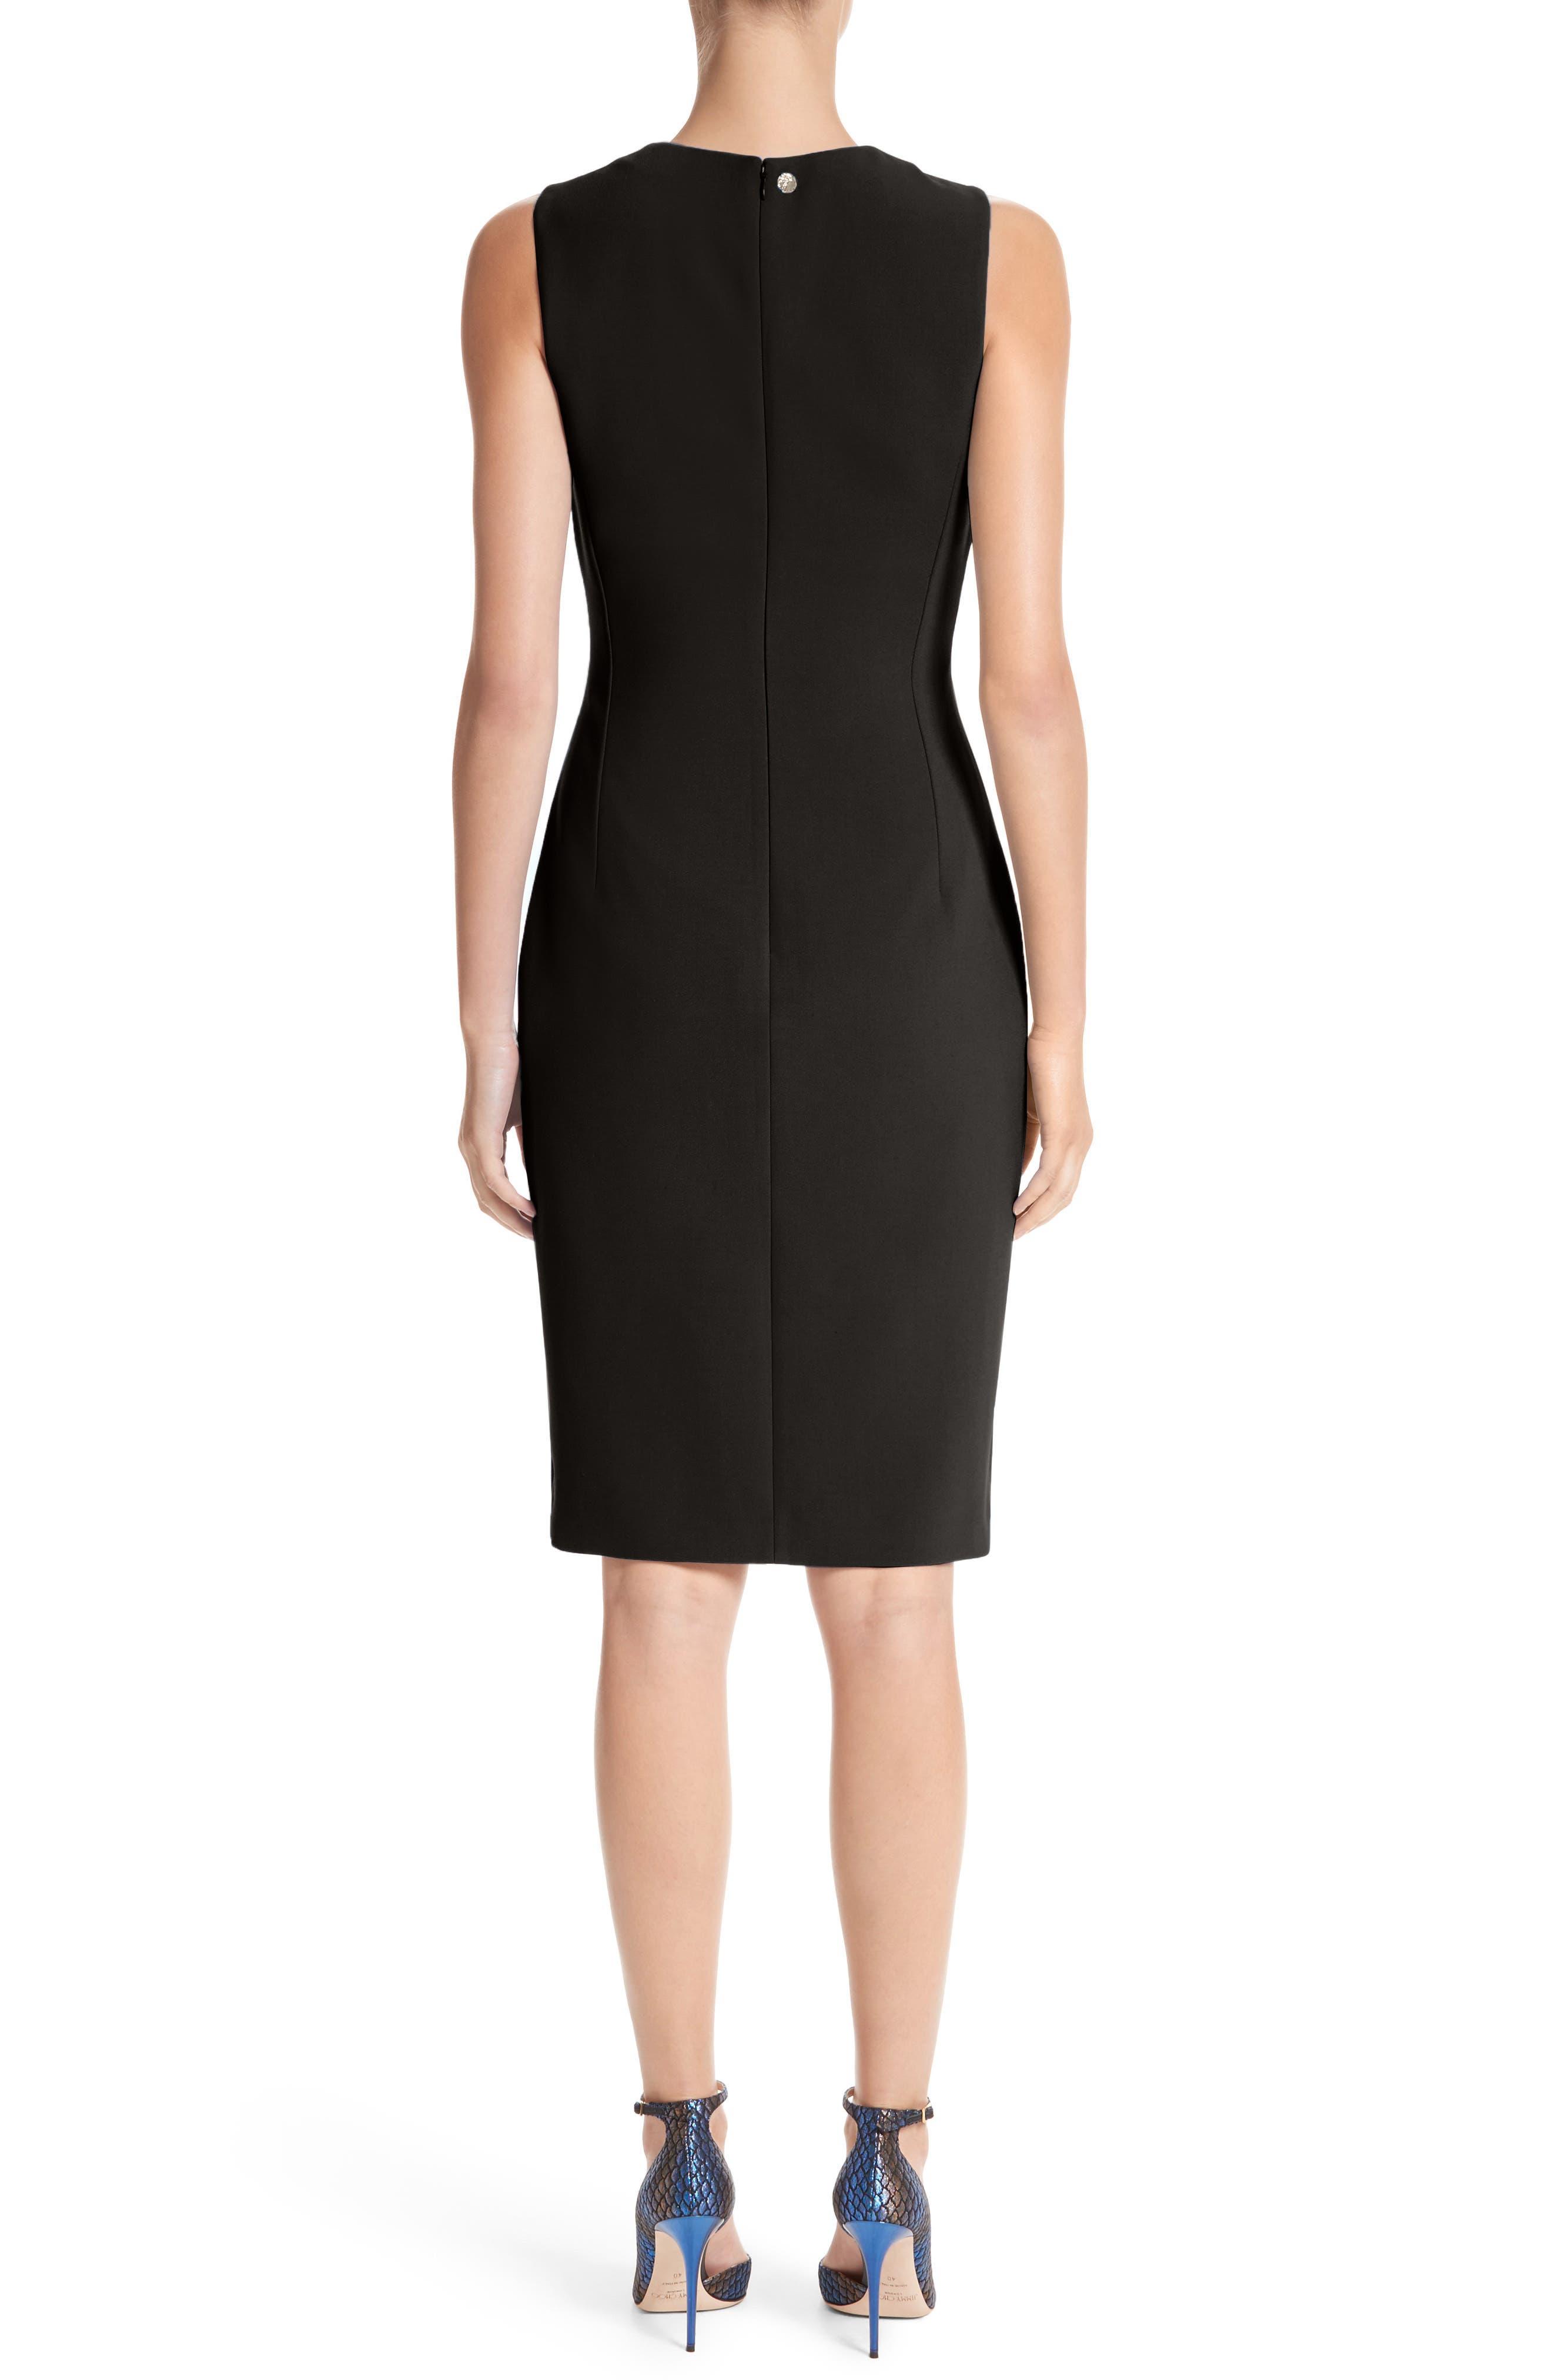 VERSACE COLLECTION, Stretch Cady Sheath Dress, Alternate thumbnail 2, color, BLACK